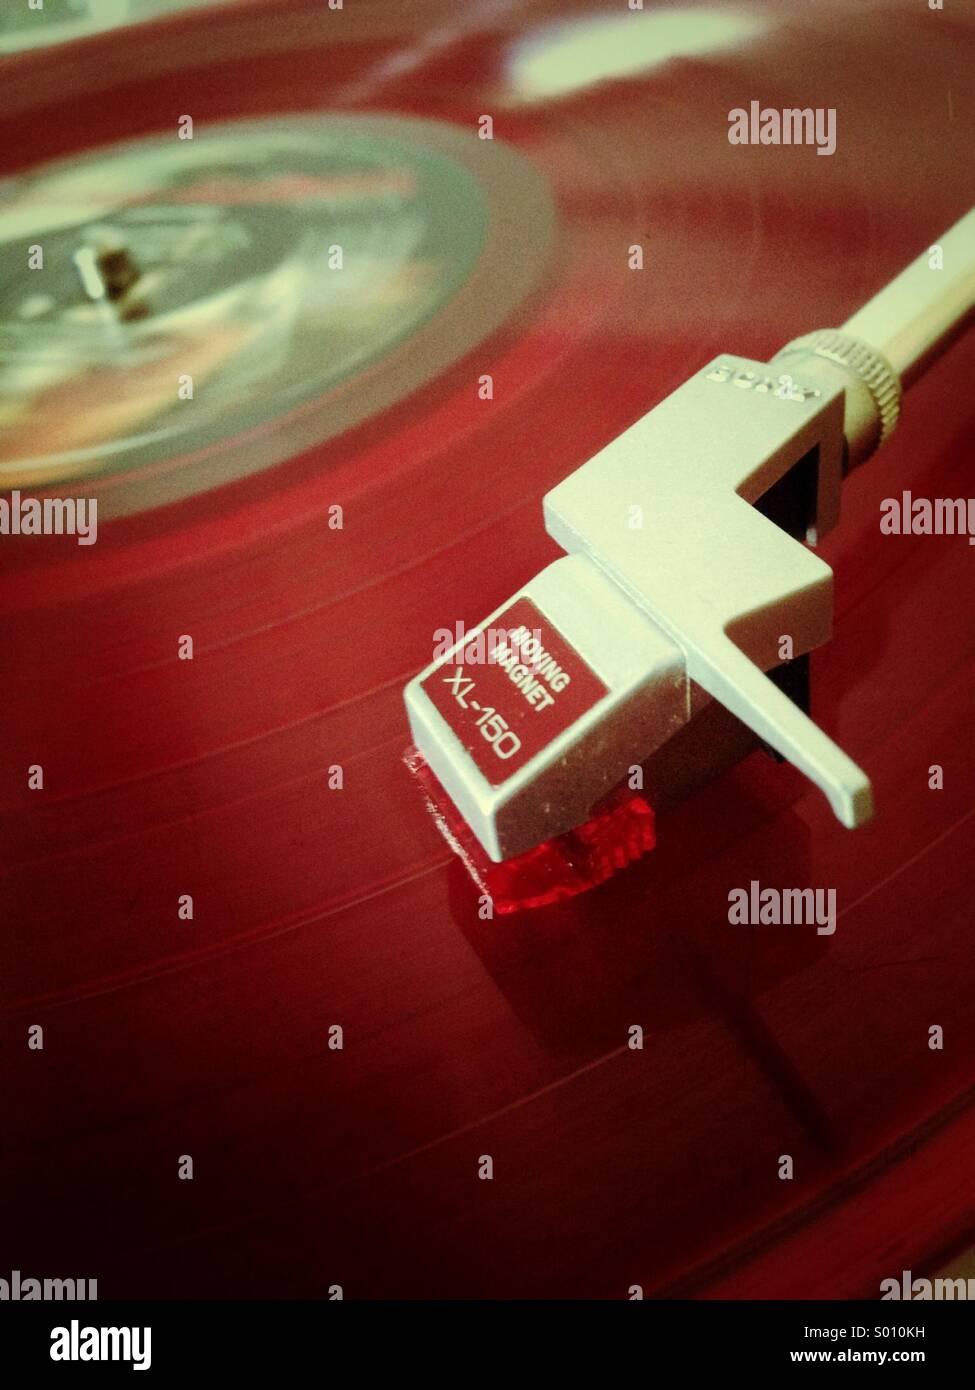 Vinyl Stock Photos & Vinyl Stock Images - Alamy